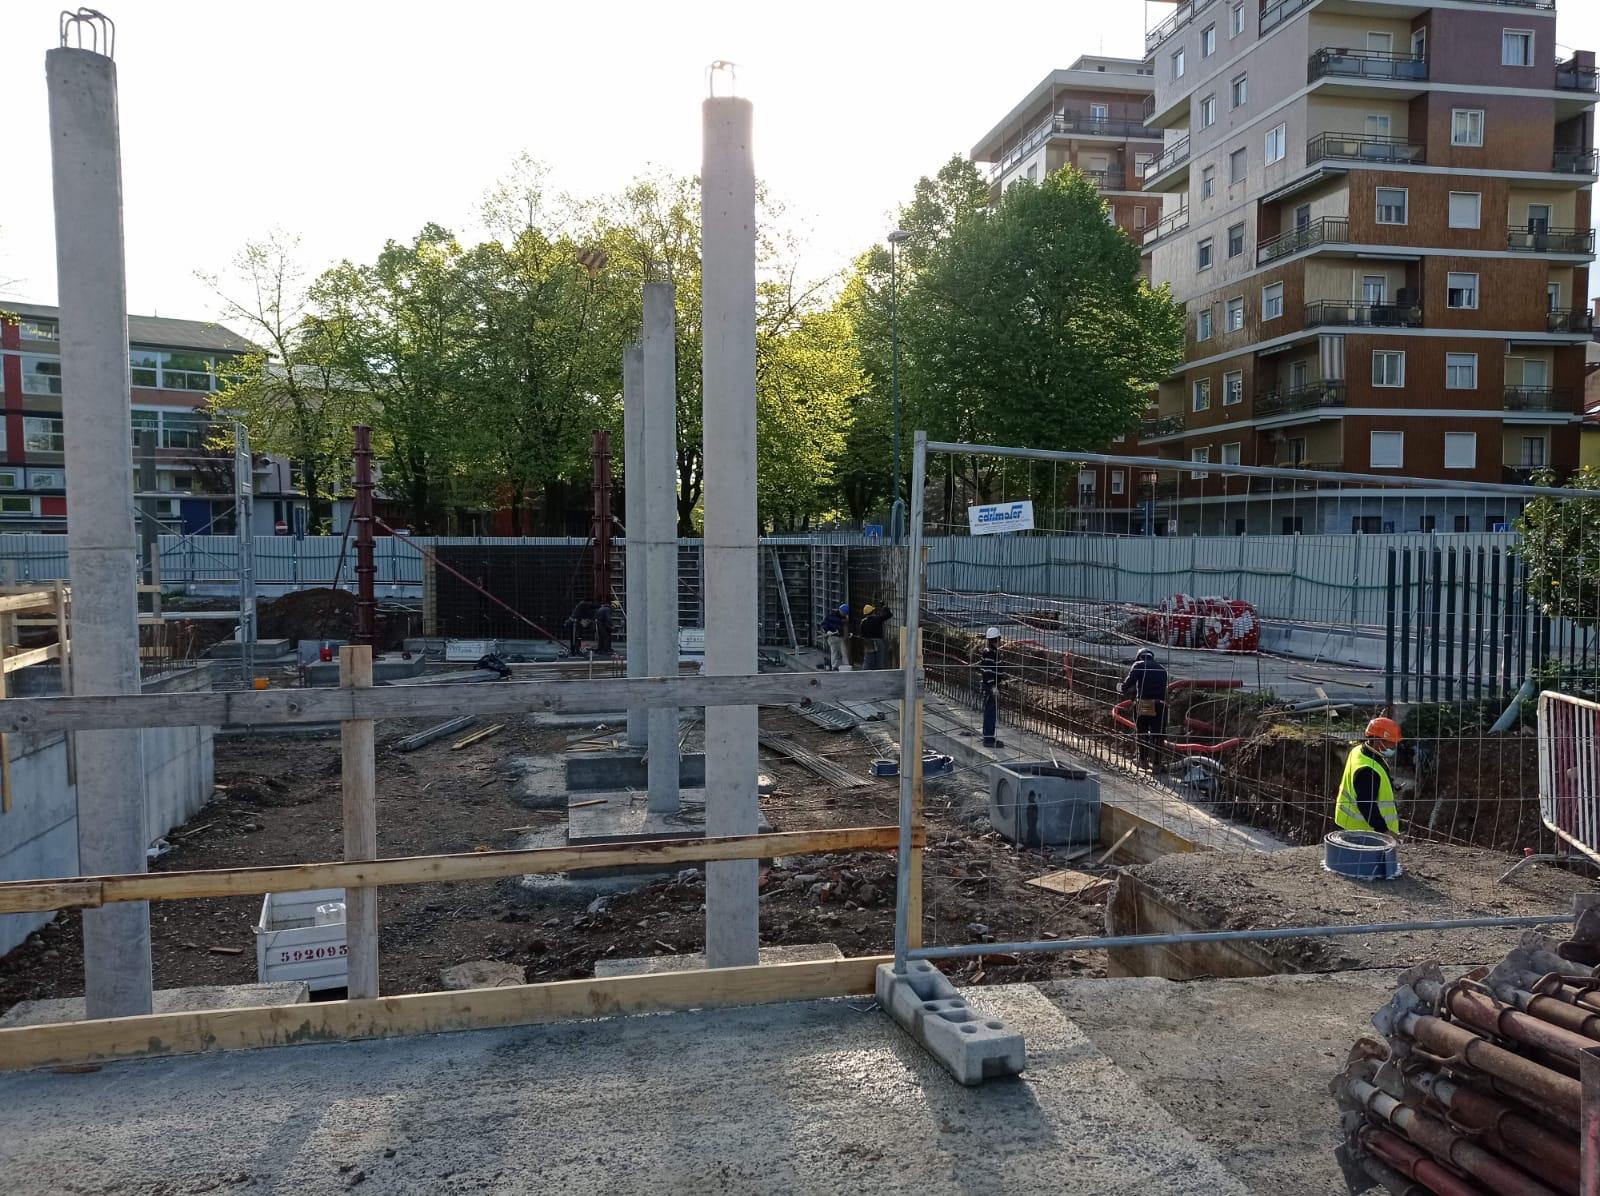 Avanzamento lavori Carmen Longo aprile 2021